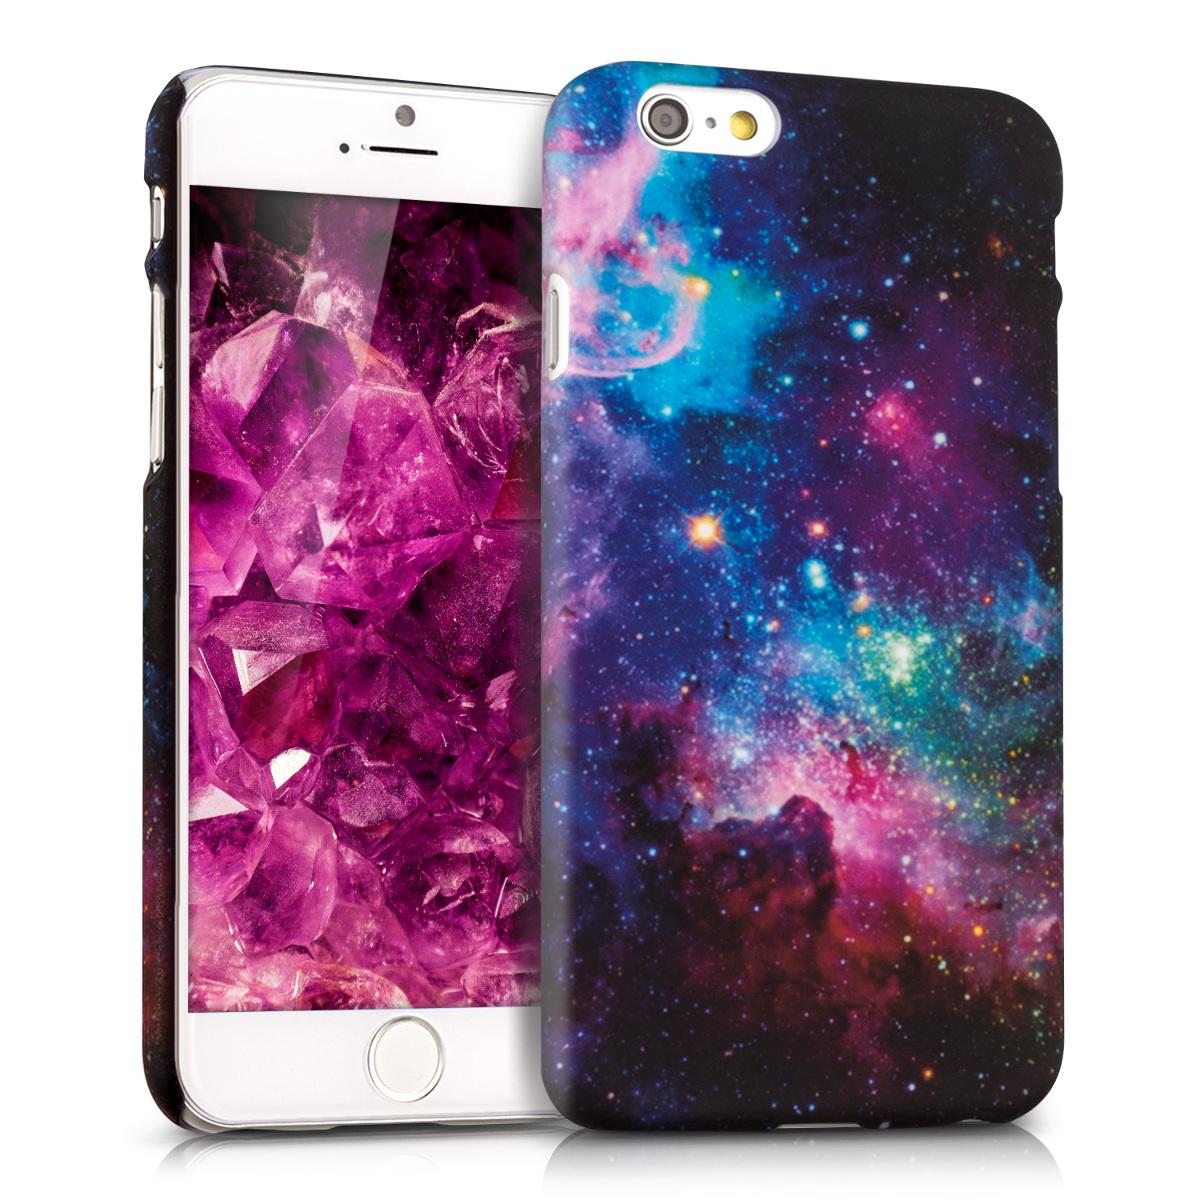 KW- Σκληρή θήκη - Apple iPhone 6 / 6S - Multicolor / Dark Pink / Black (34954.01)